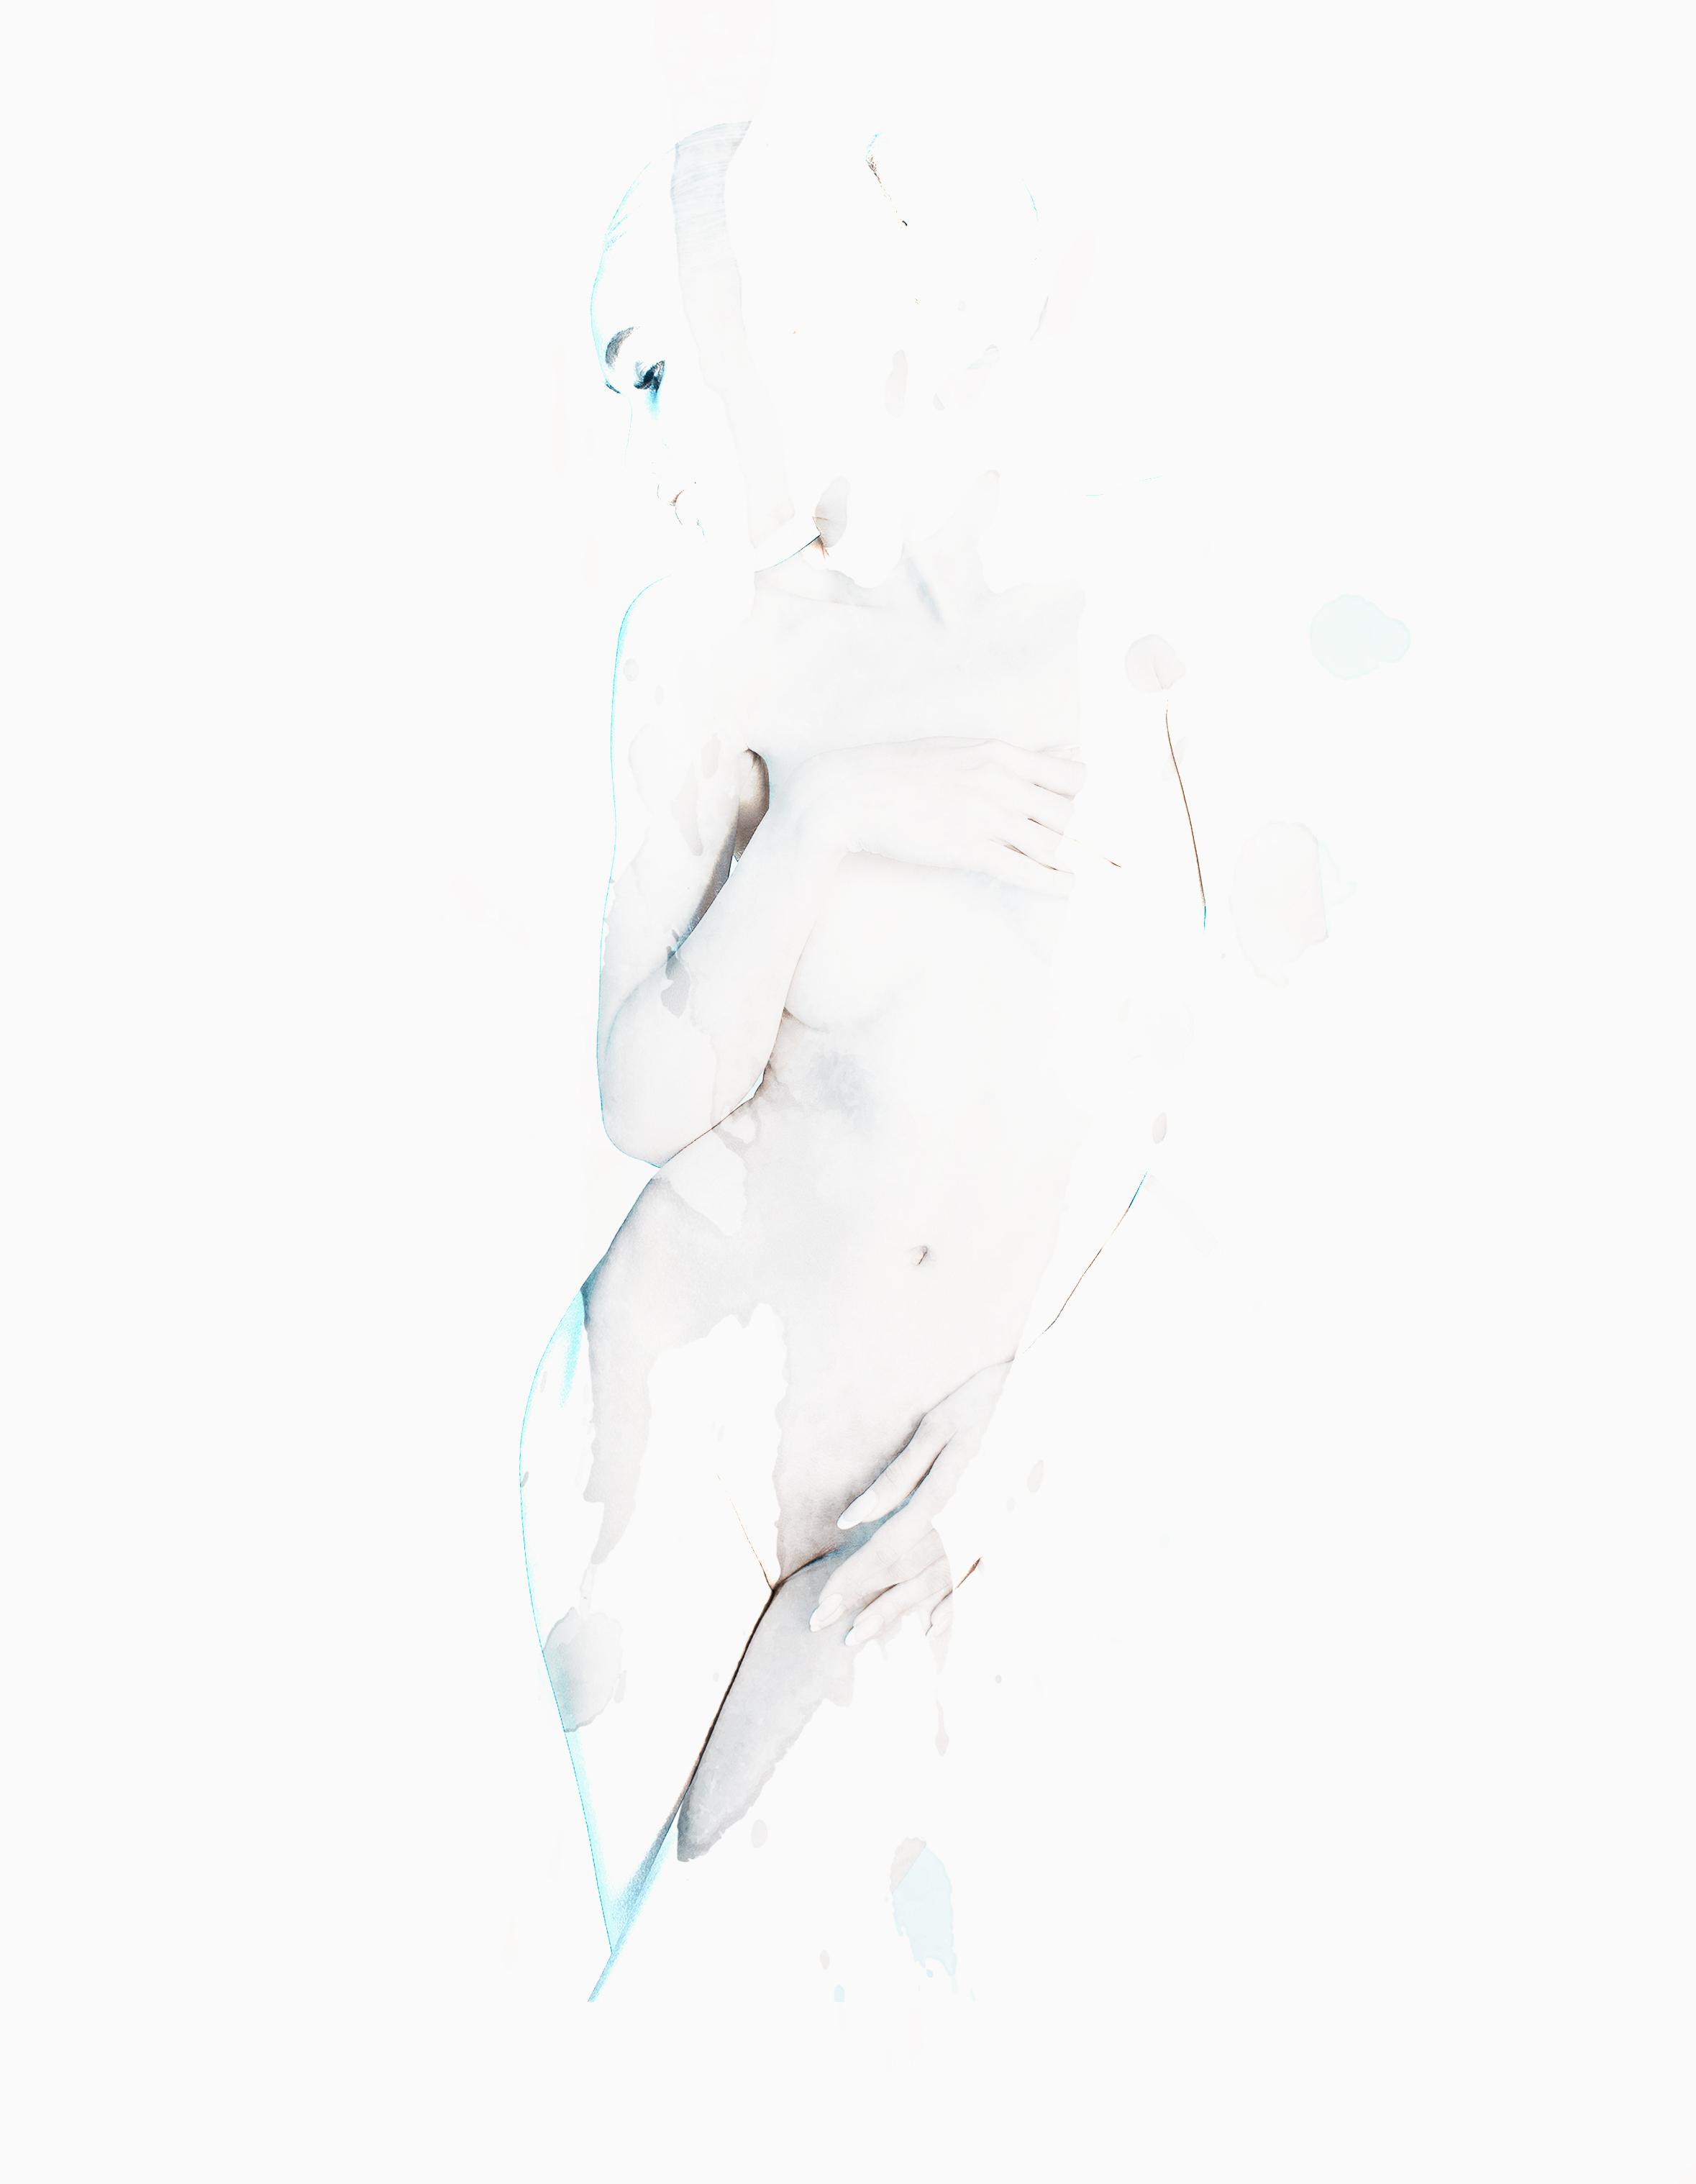 watercolor5_3.jpg